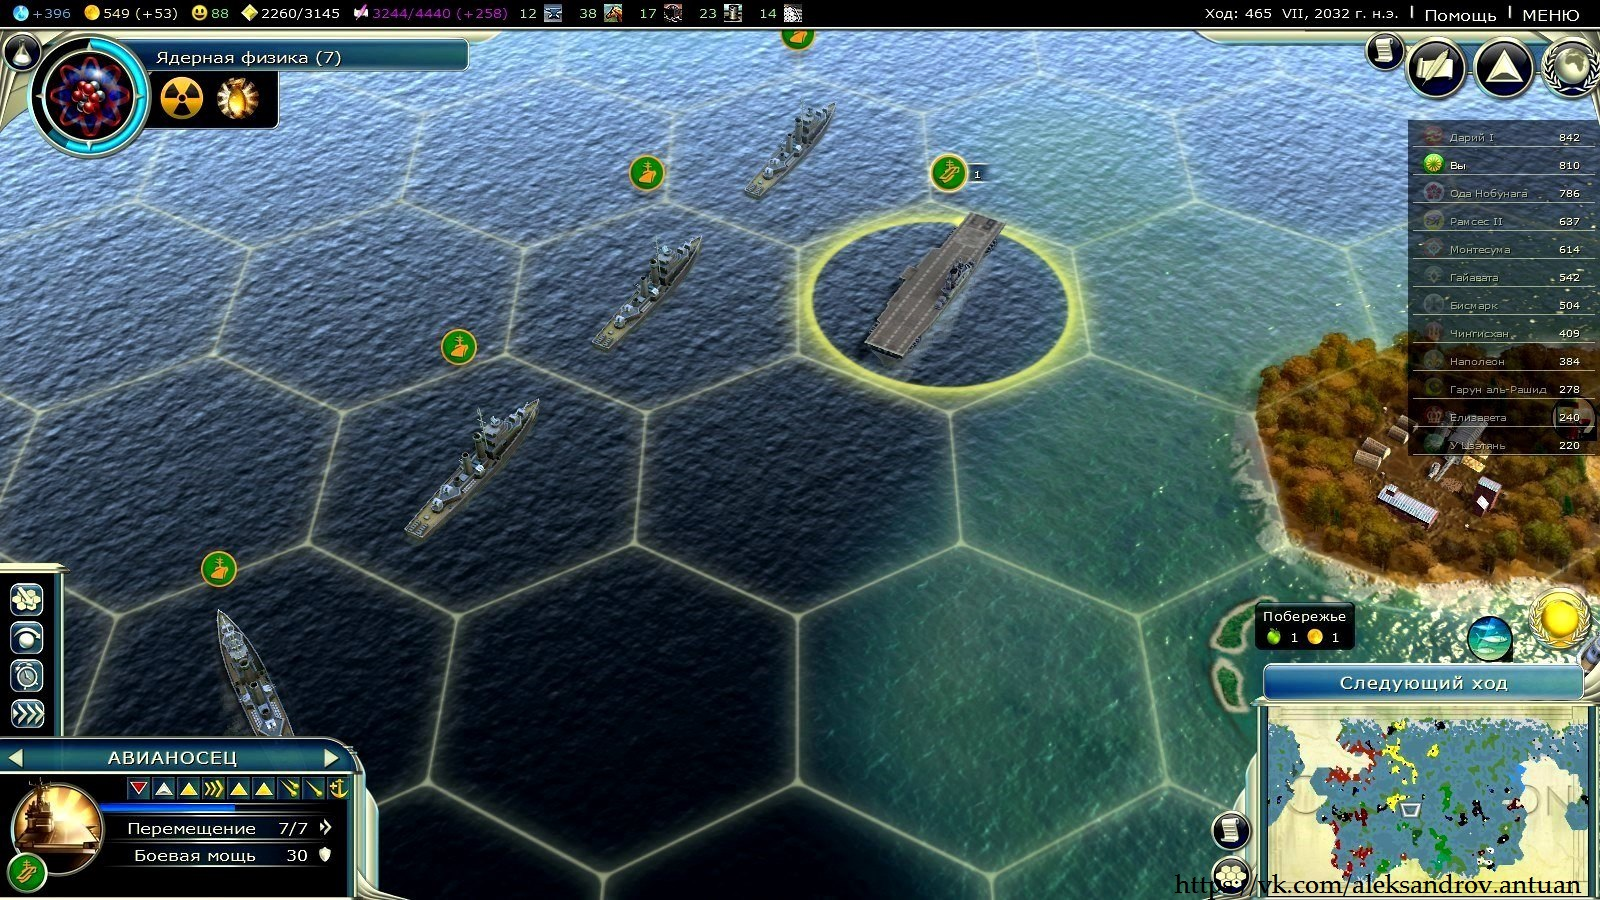 Индийский авианосец. - Sid Meier's Civilization 5 авианосец, эсминец